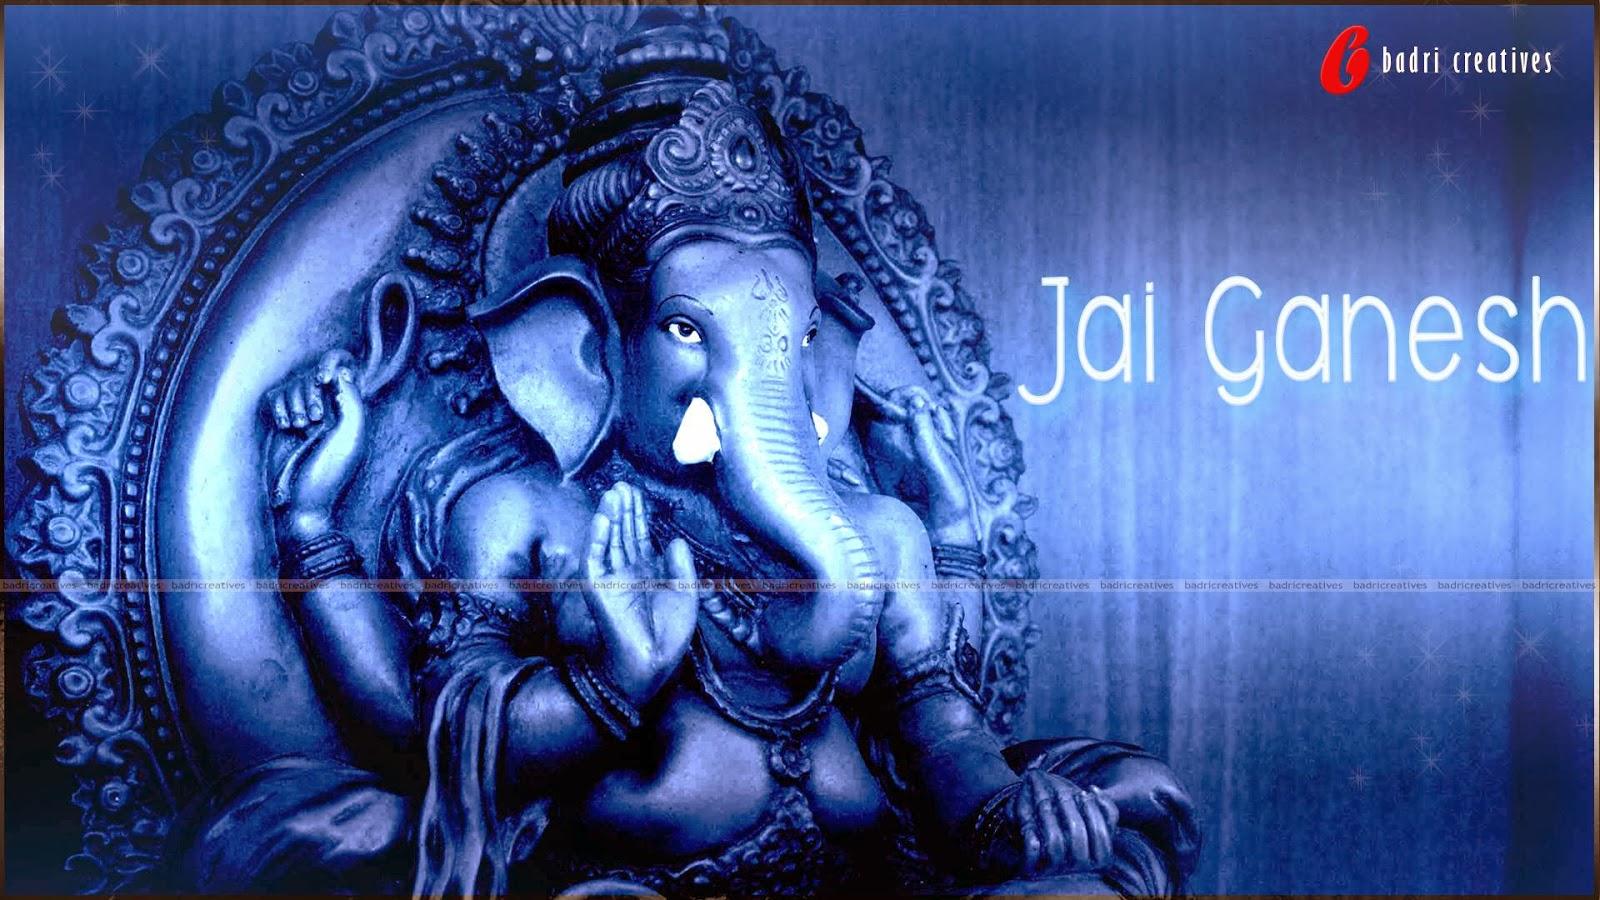 Lord Ganesha Pictures Hd: Ganpati Wallpaper HD